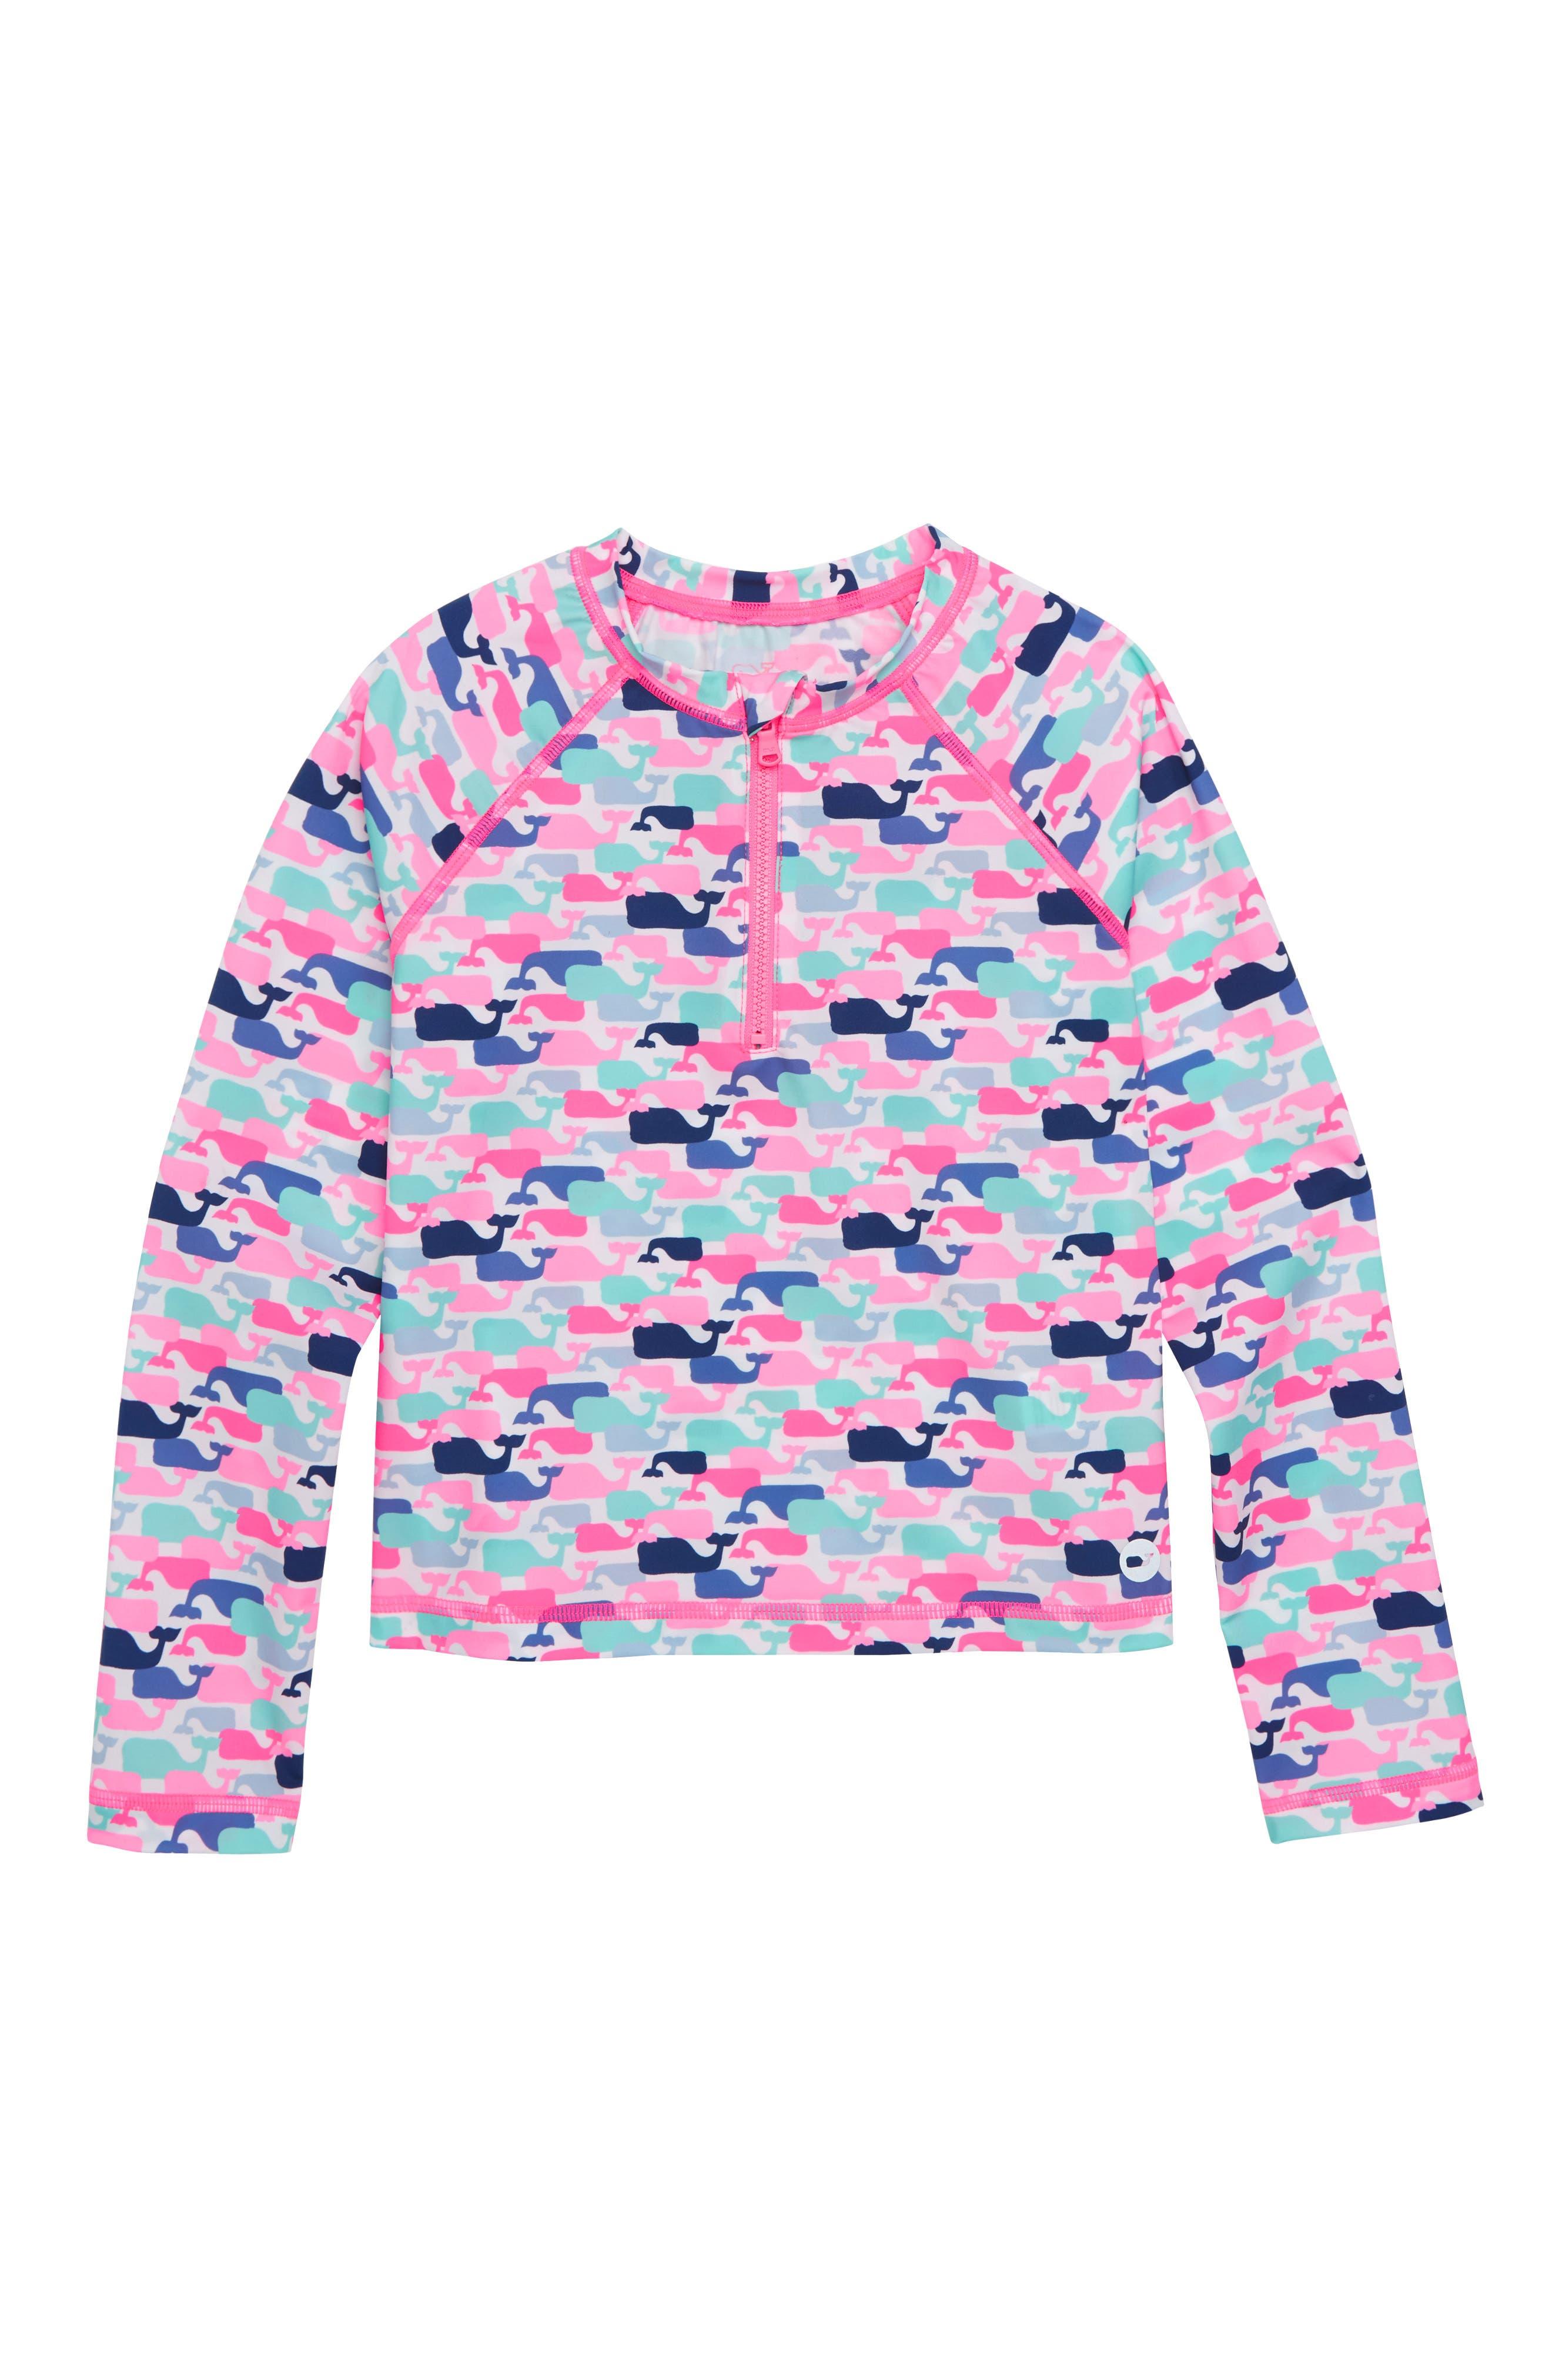 Whale Pattern Long Sleeve Rashguard,                             Main thumbnail 1, color,                             100